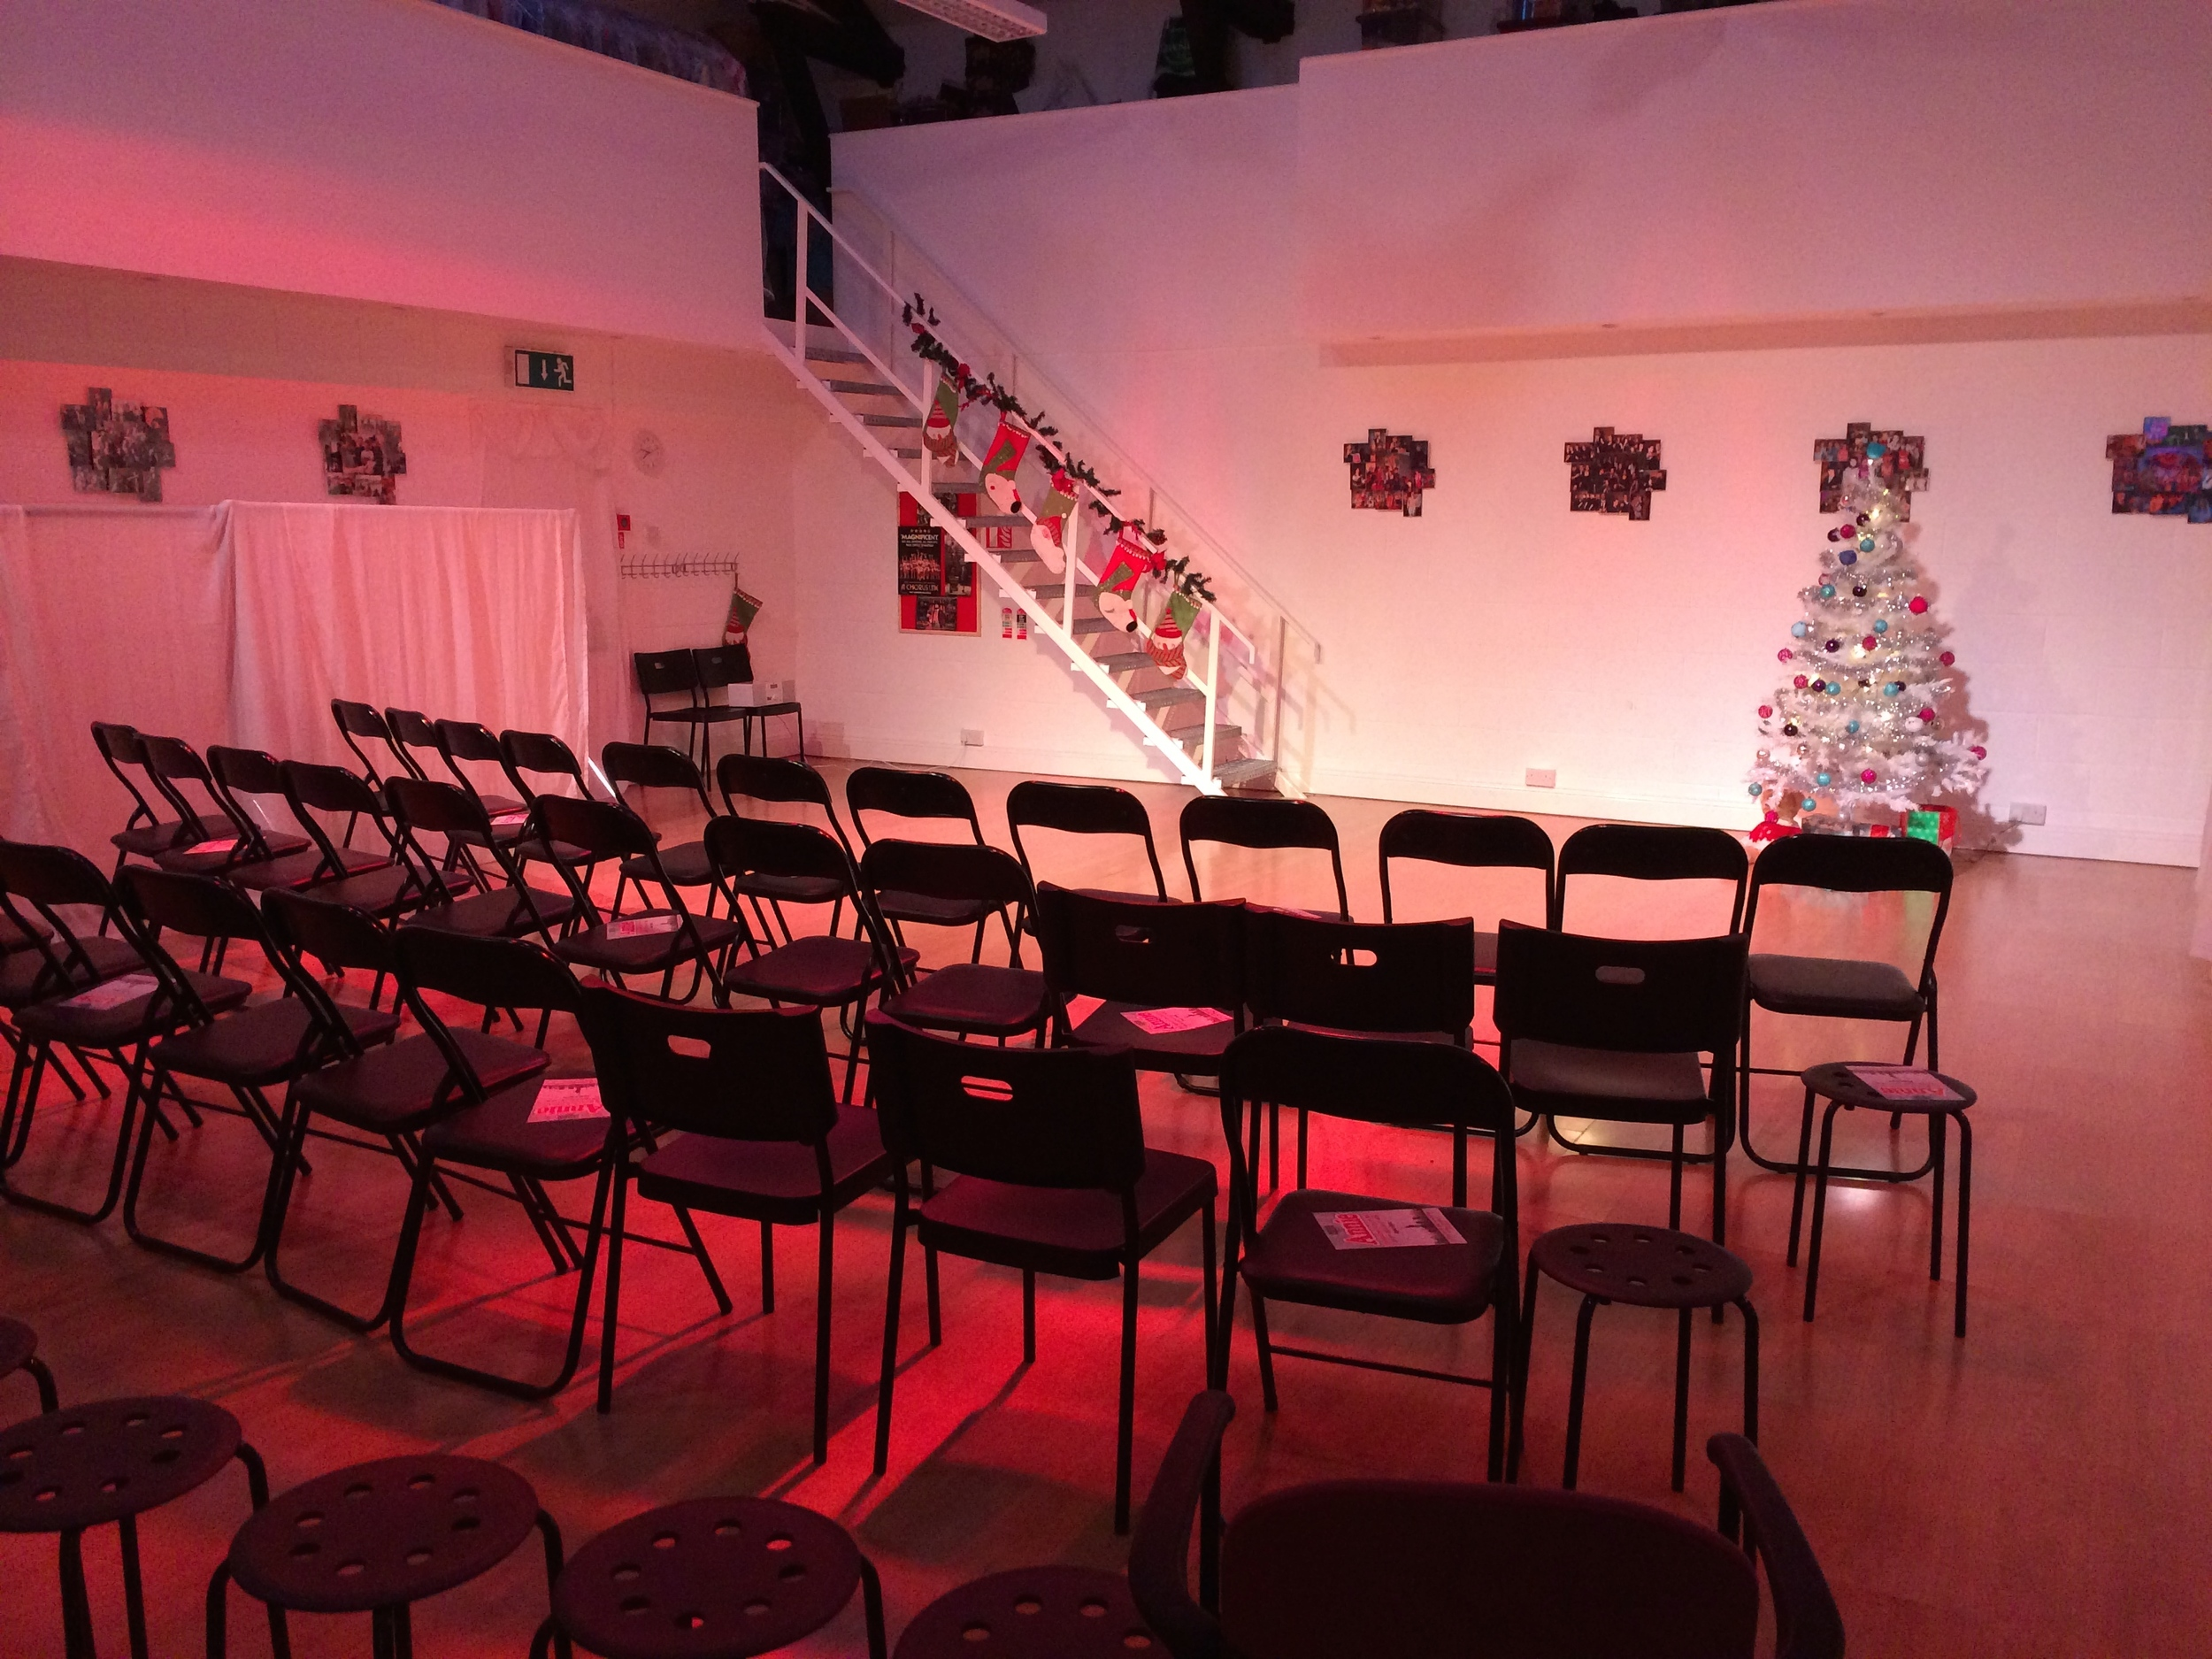 Set up for Christmas Recital Clonskeagh.jpg